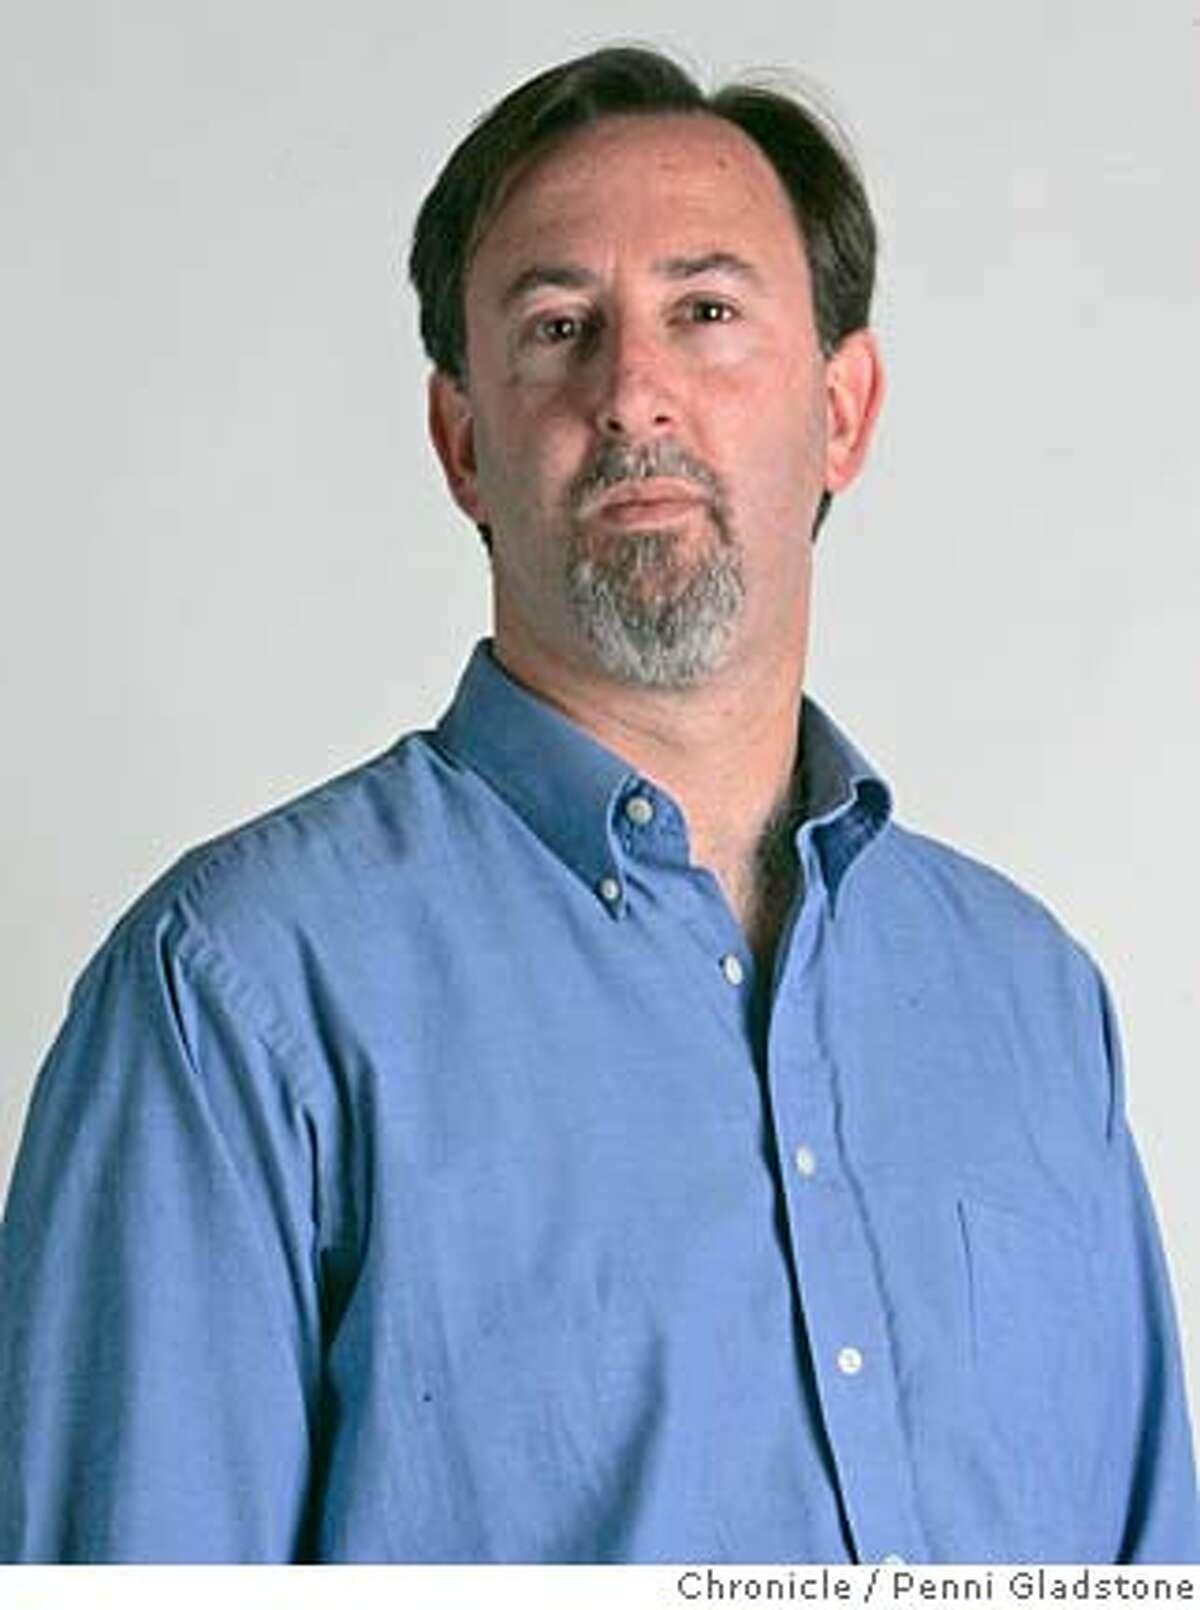 sf chron writer, Mark Fainaru-Wada. photo by penni gladstone, sf chronicle 5/3/06